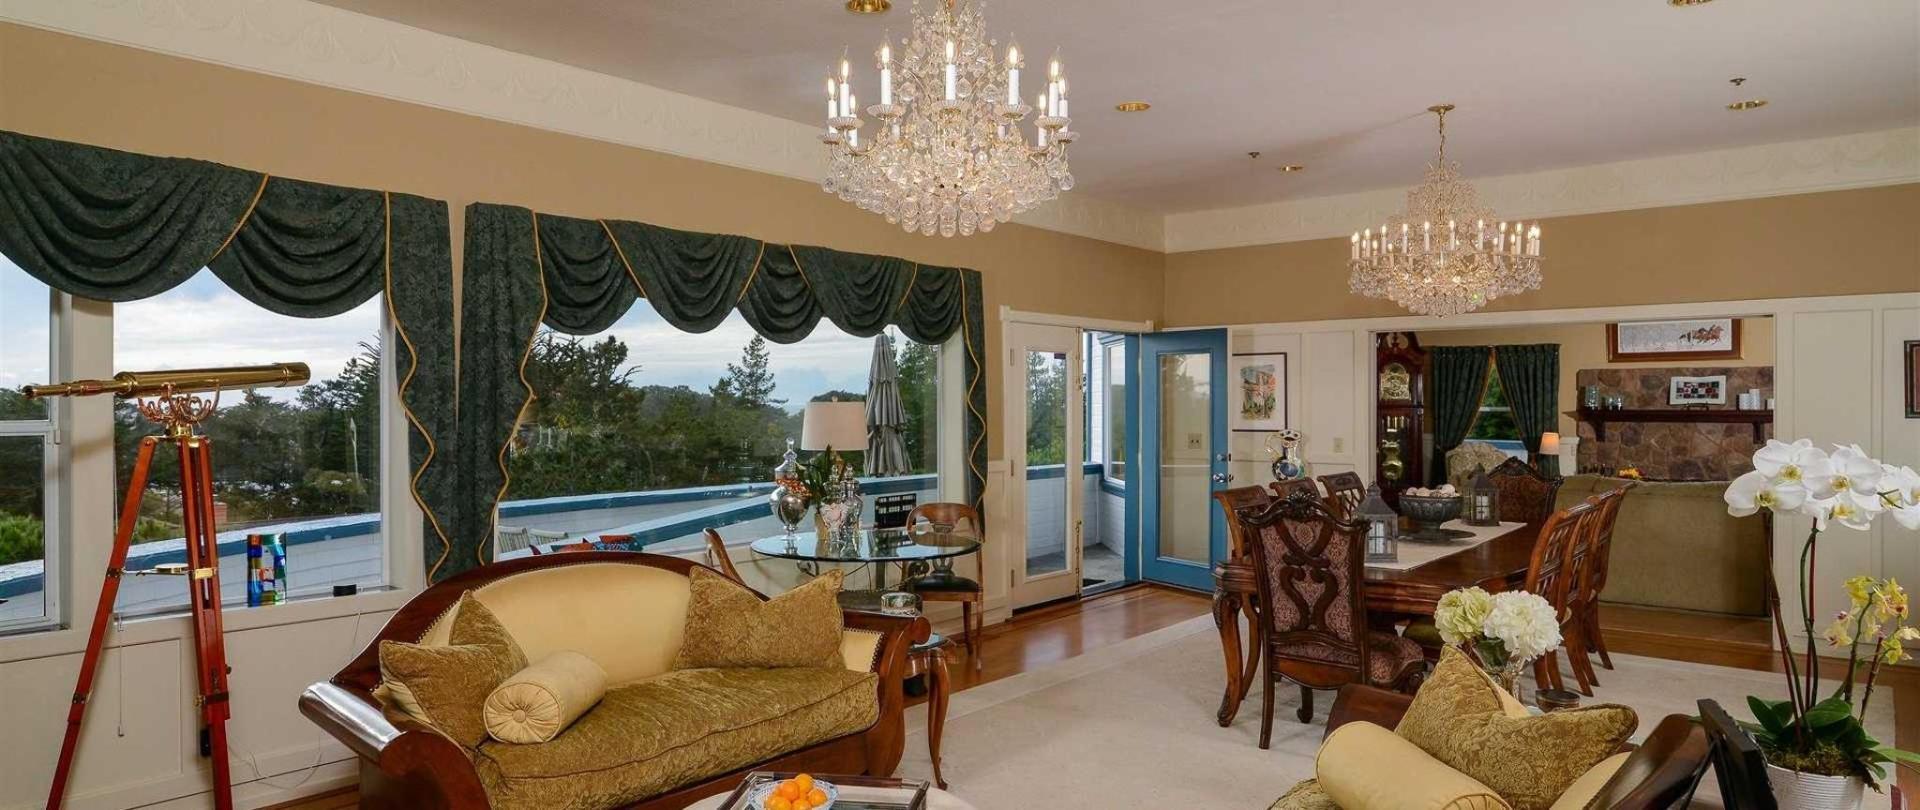 Bay Hill Mansion Bed & Breakfast